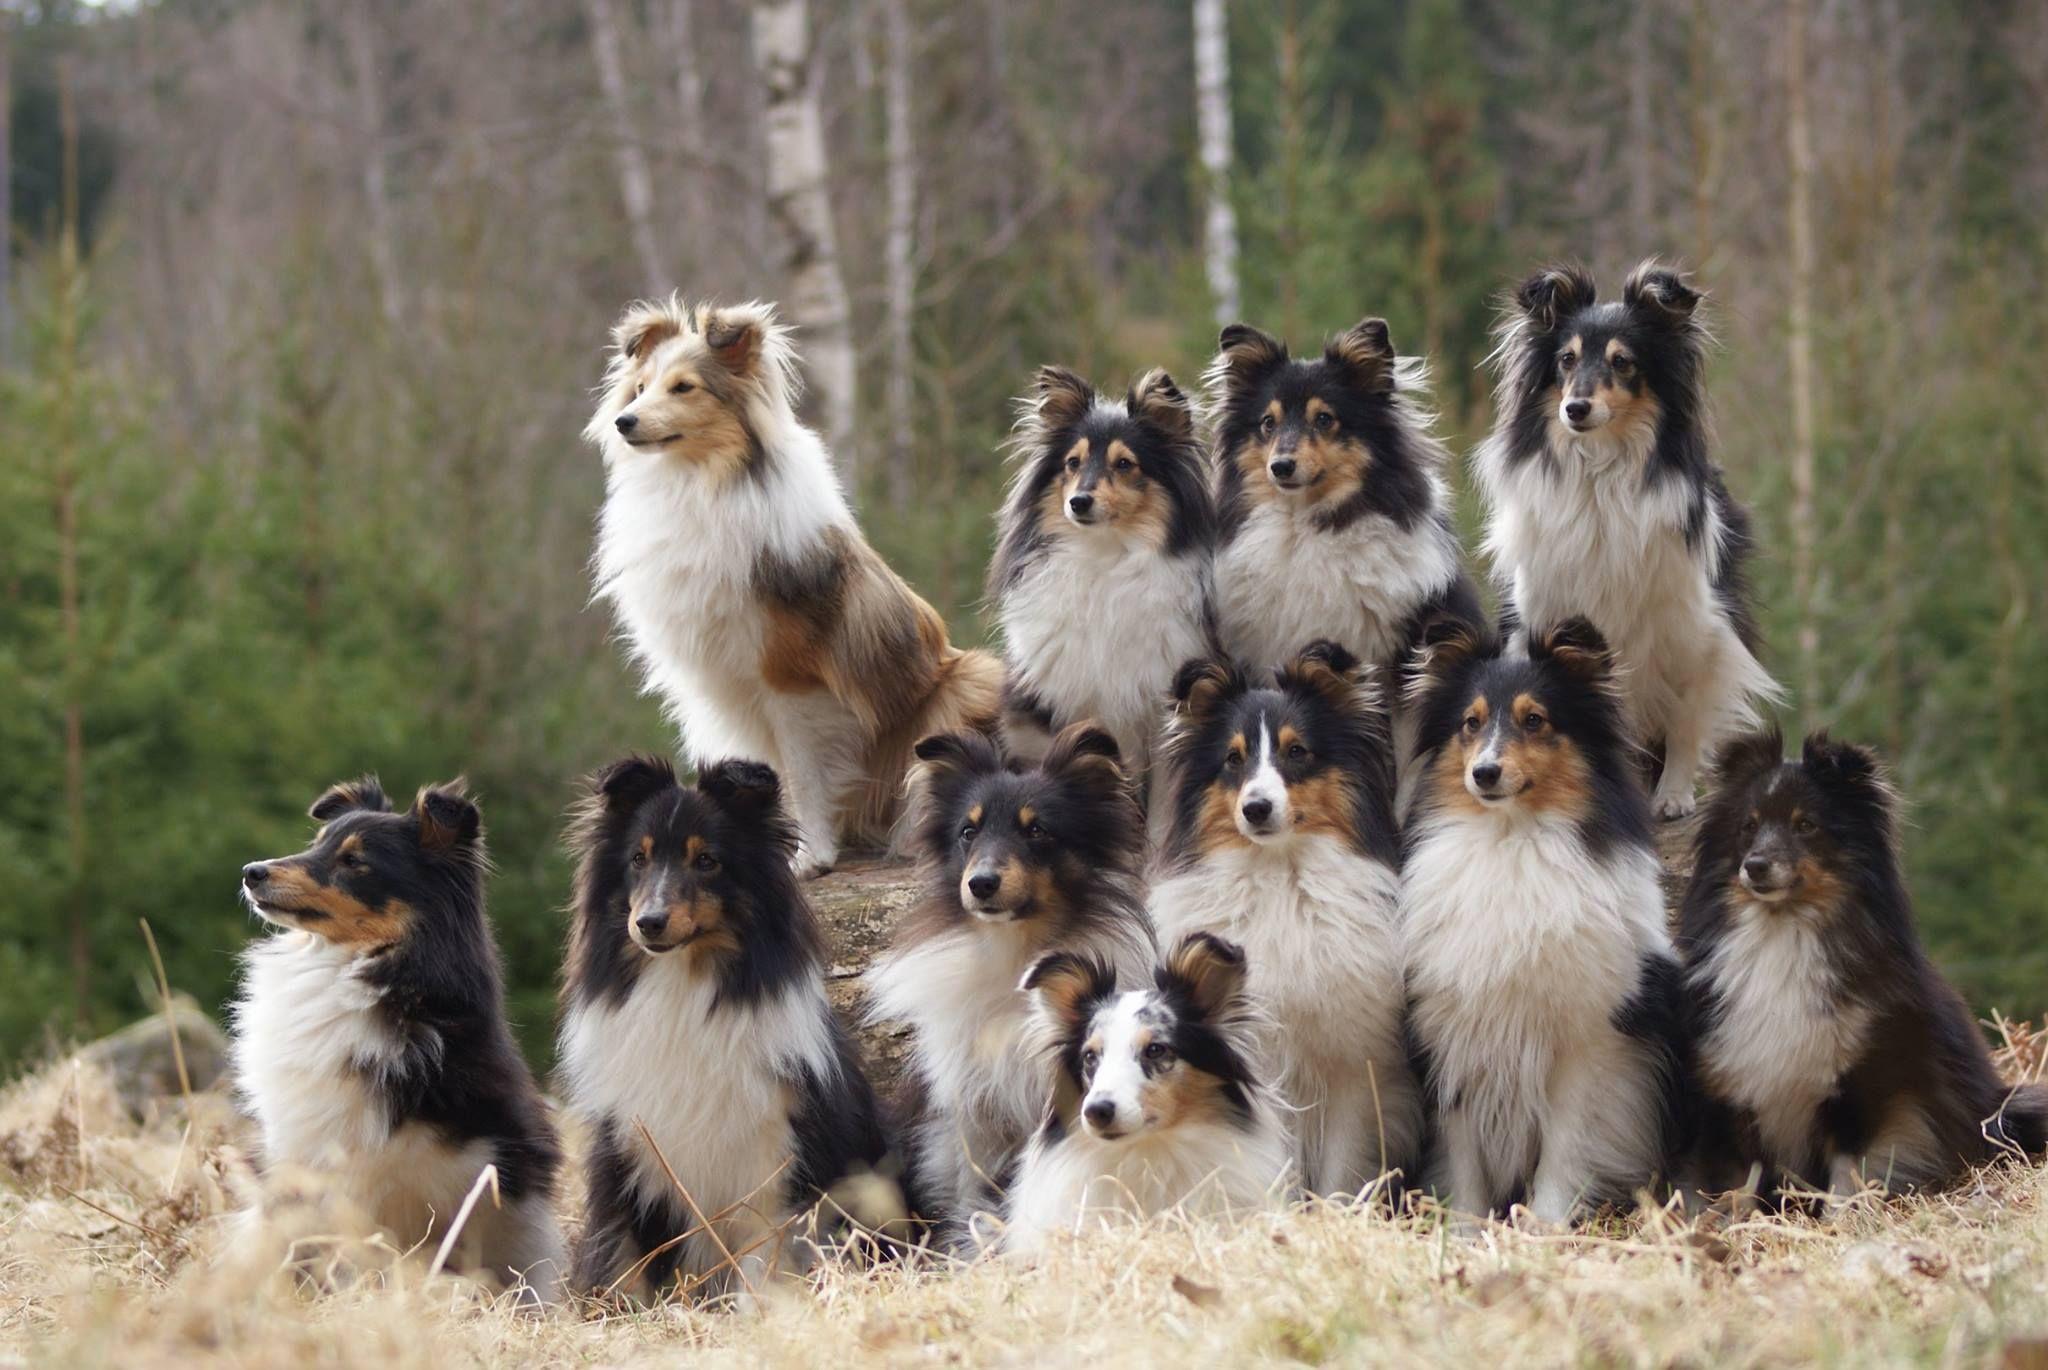 Pets For Sale In Northern Va Craigslist References